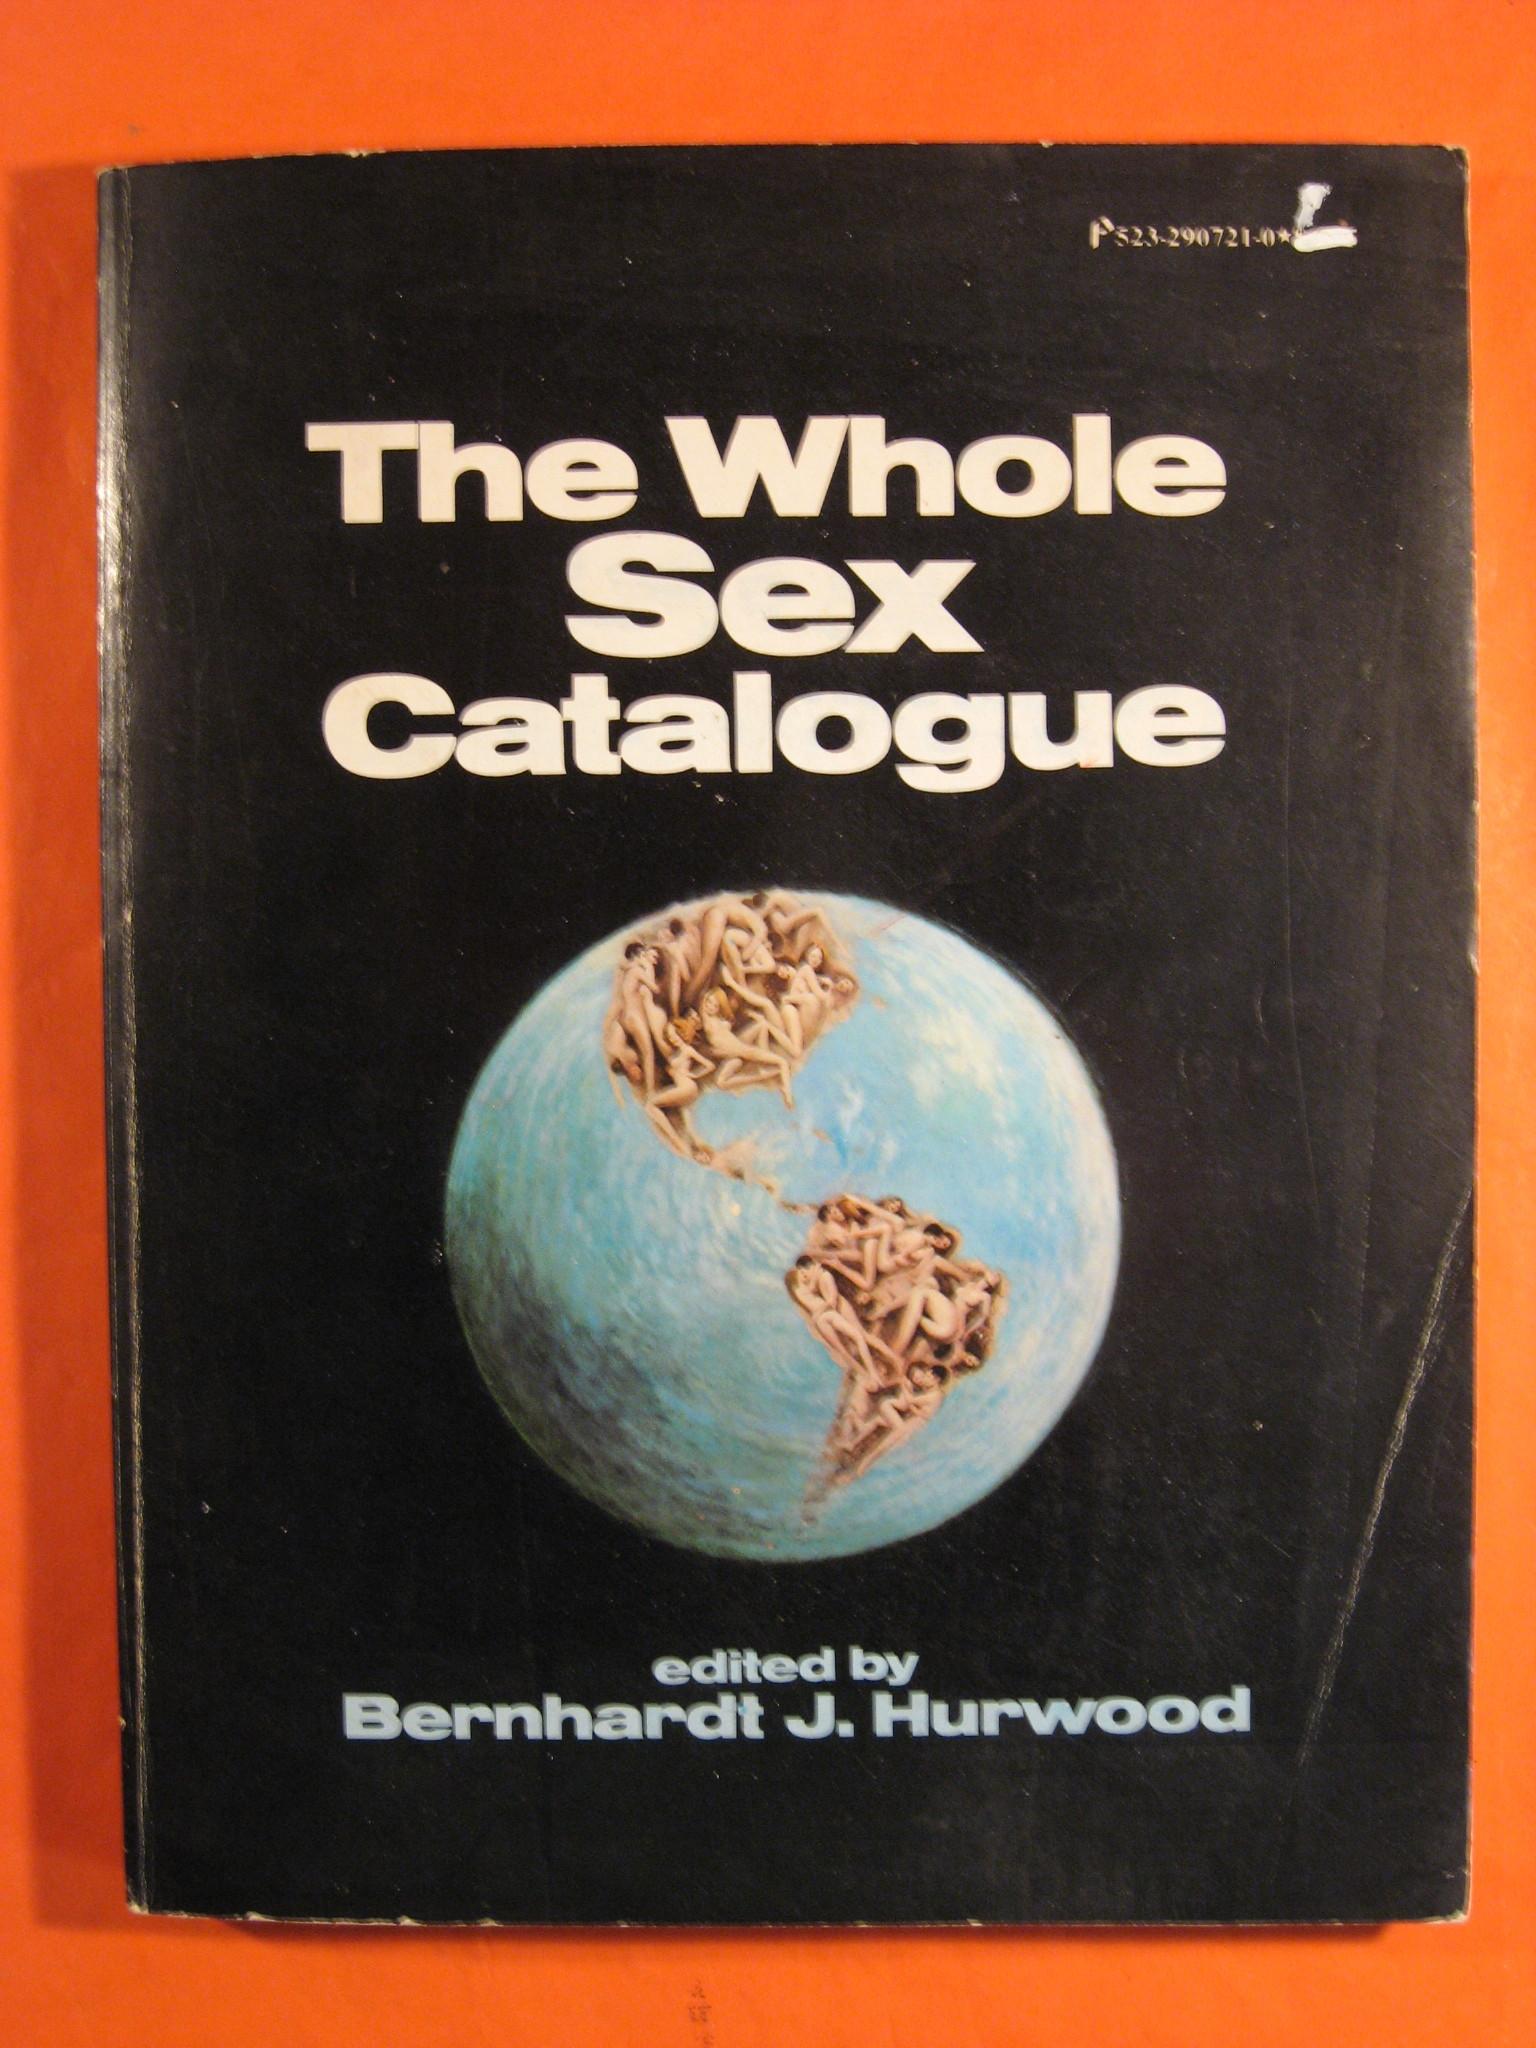 The Whole Sex Catalogue, Hurwood, Bernhardt, J.